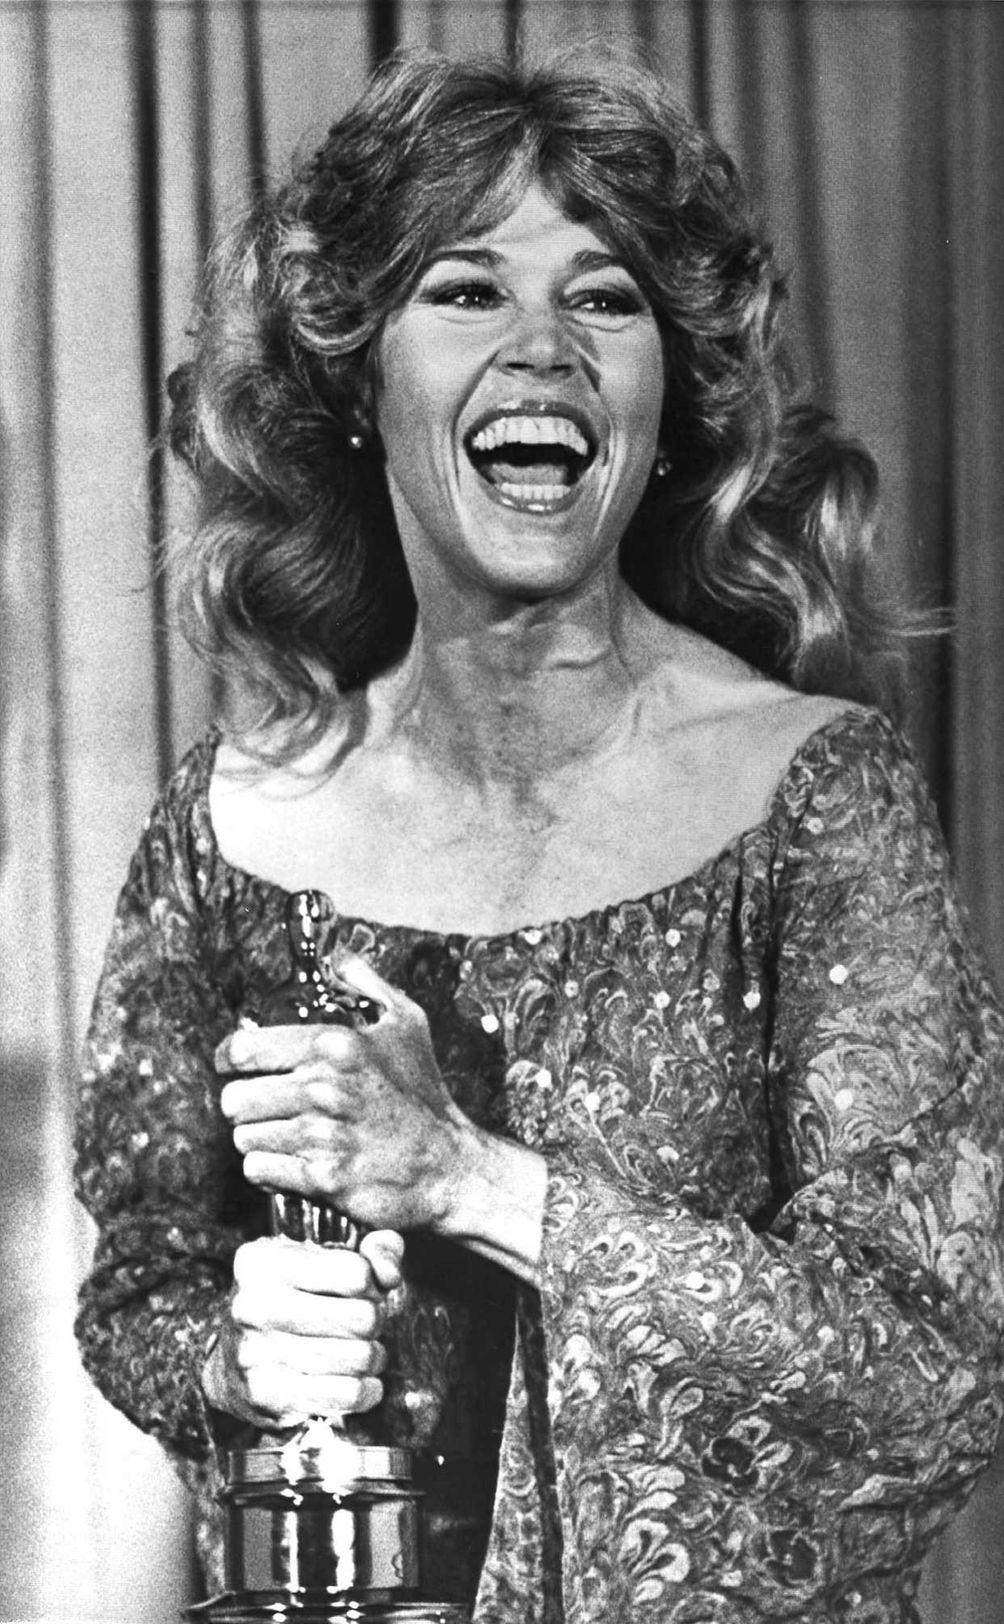 1978 - Jane Fonda - Coming Home Jane